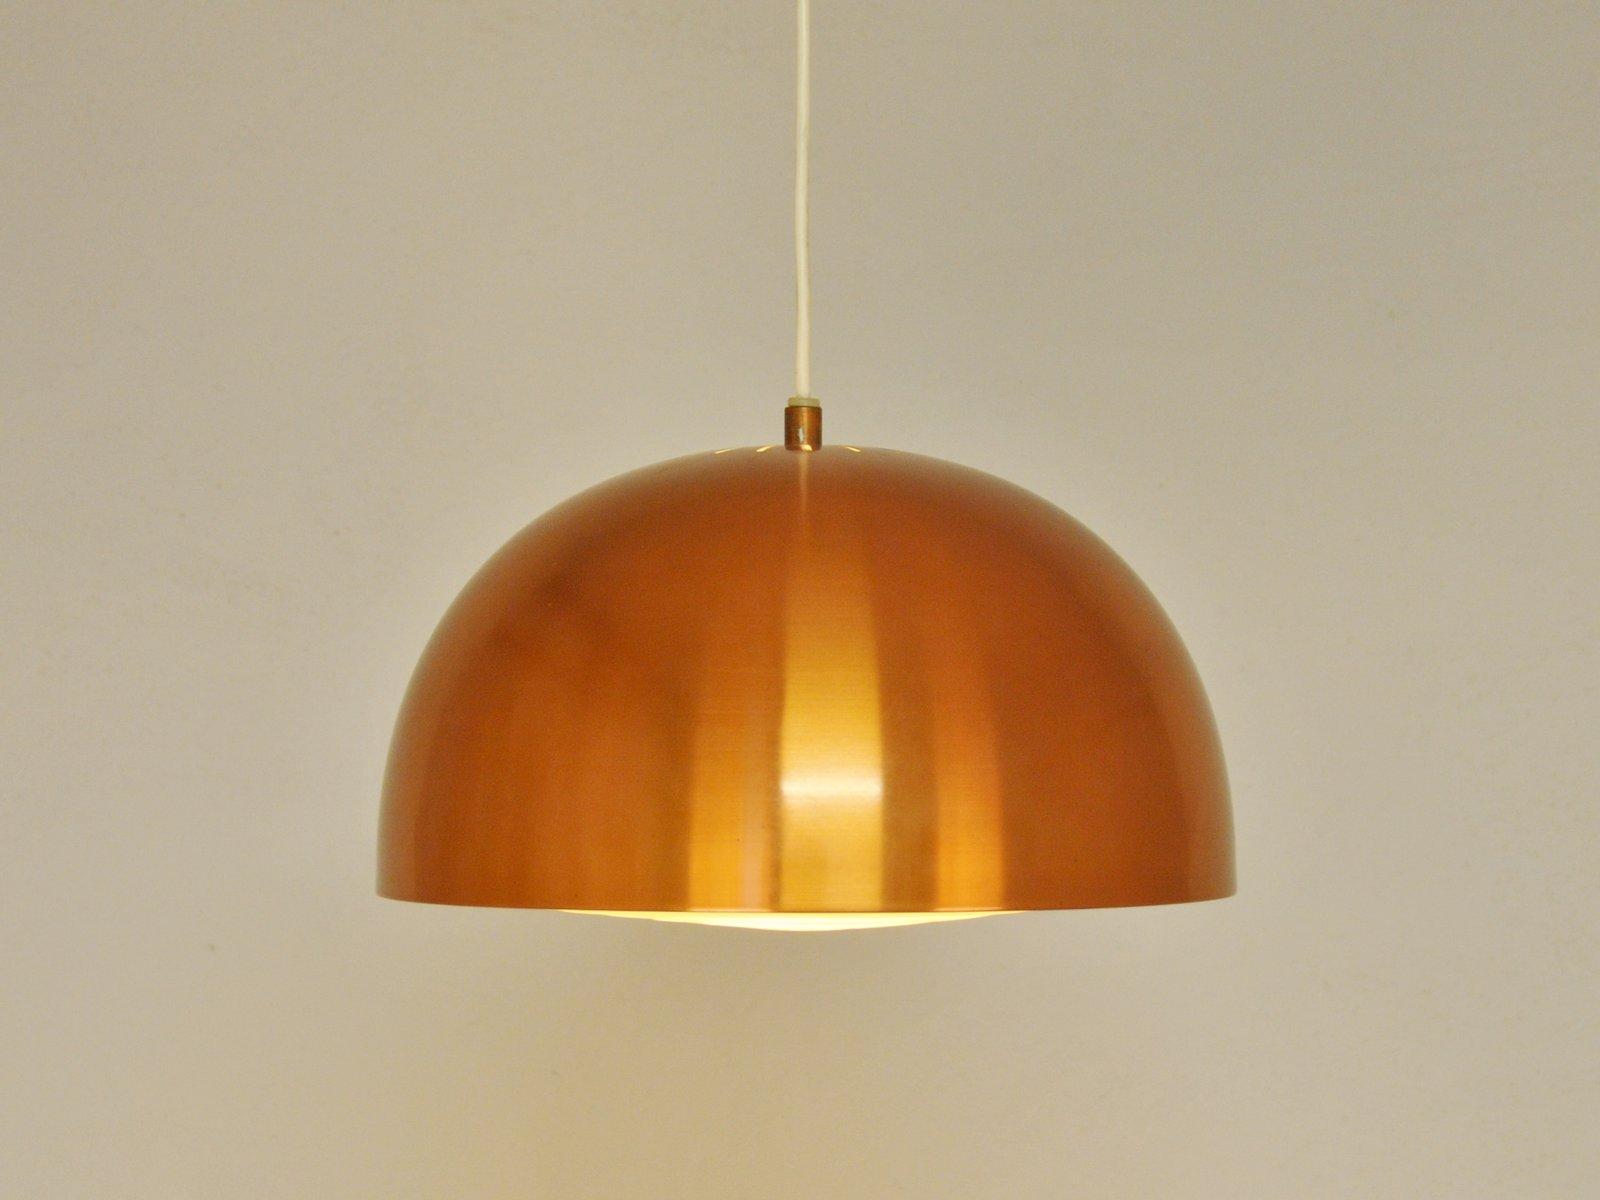 lampe suspension vintage scandinave en cuivre 1960s en vente sur pamono. Black Bedroom Furniture Sets. Home Design Ideas